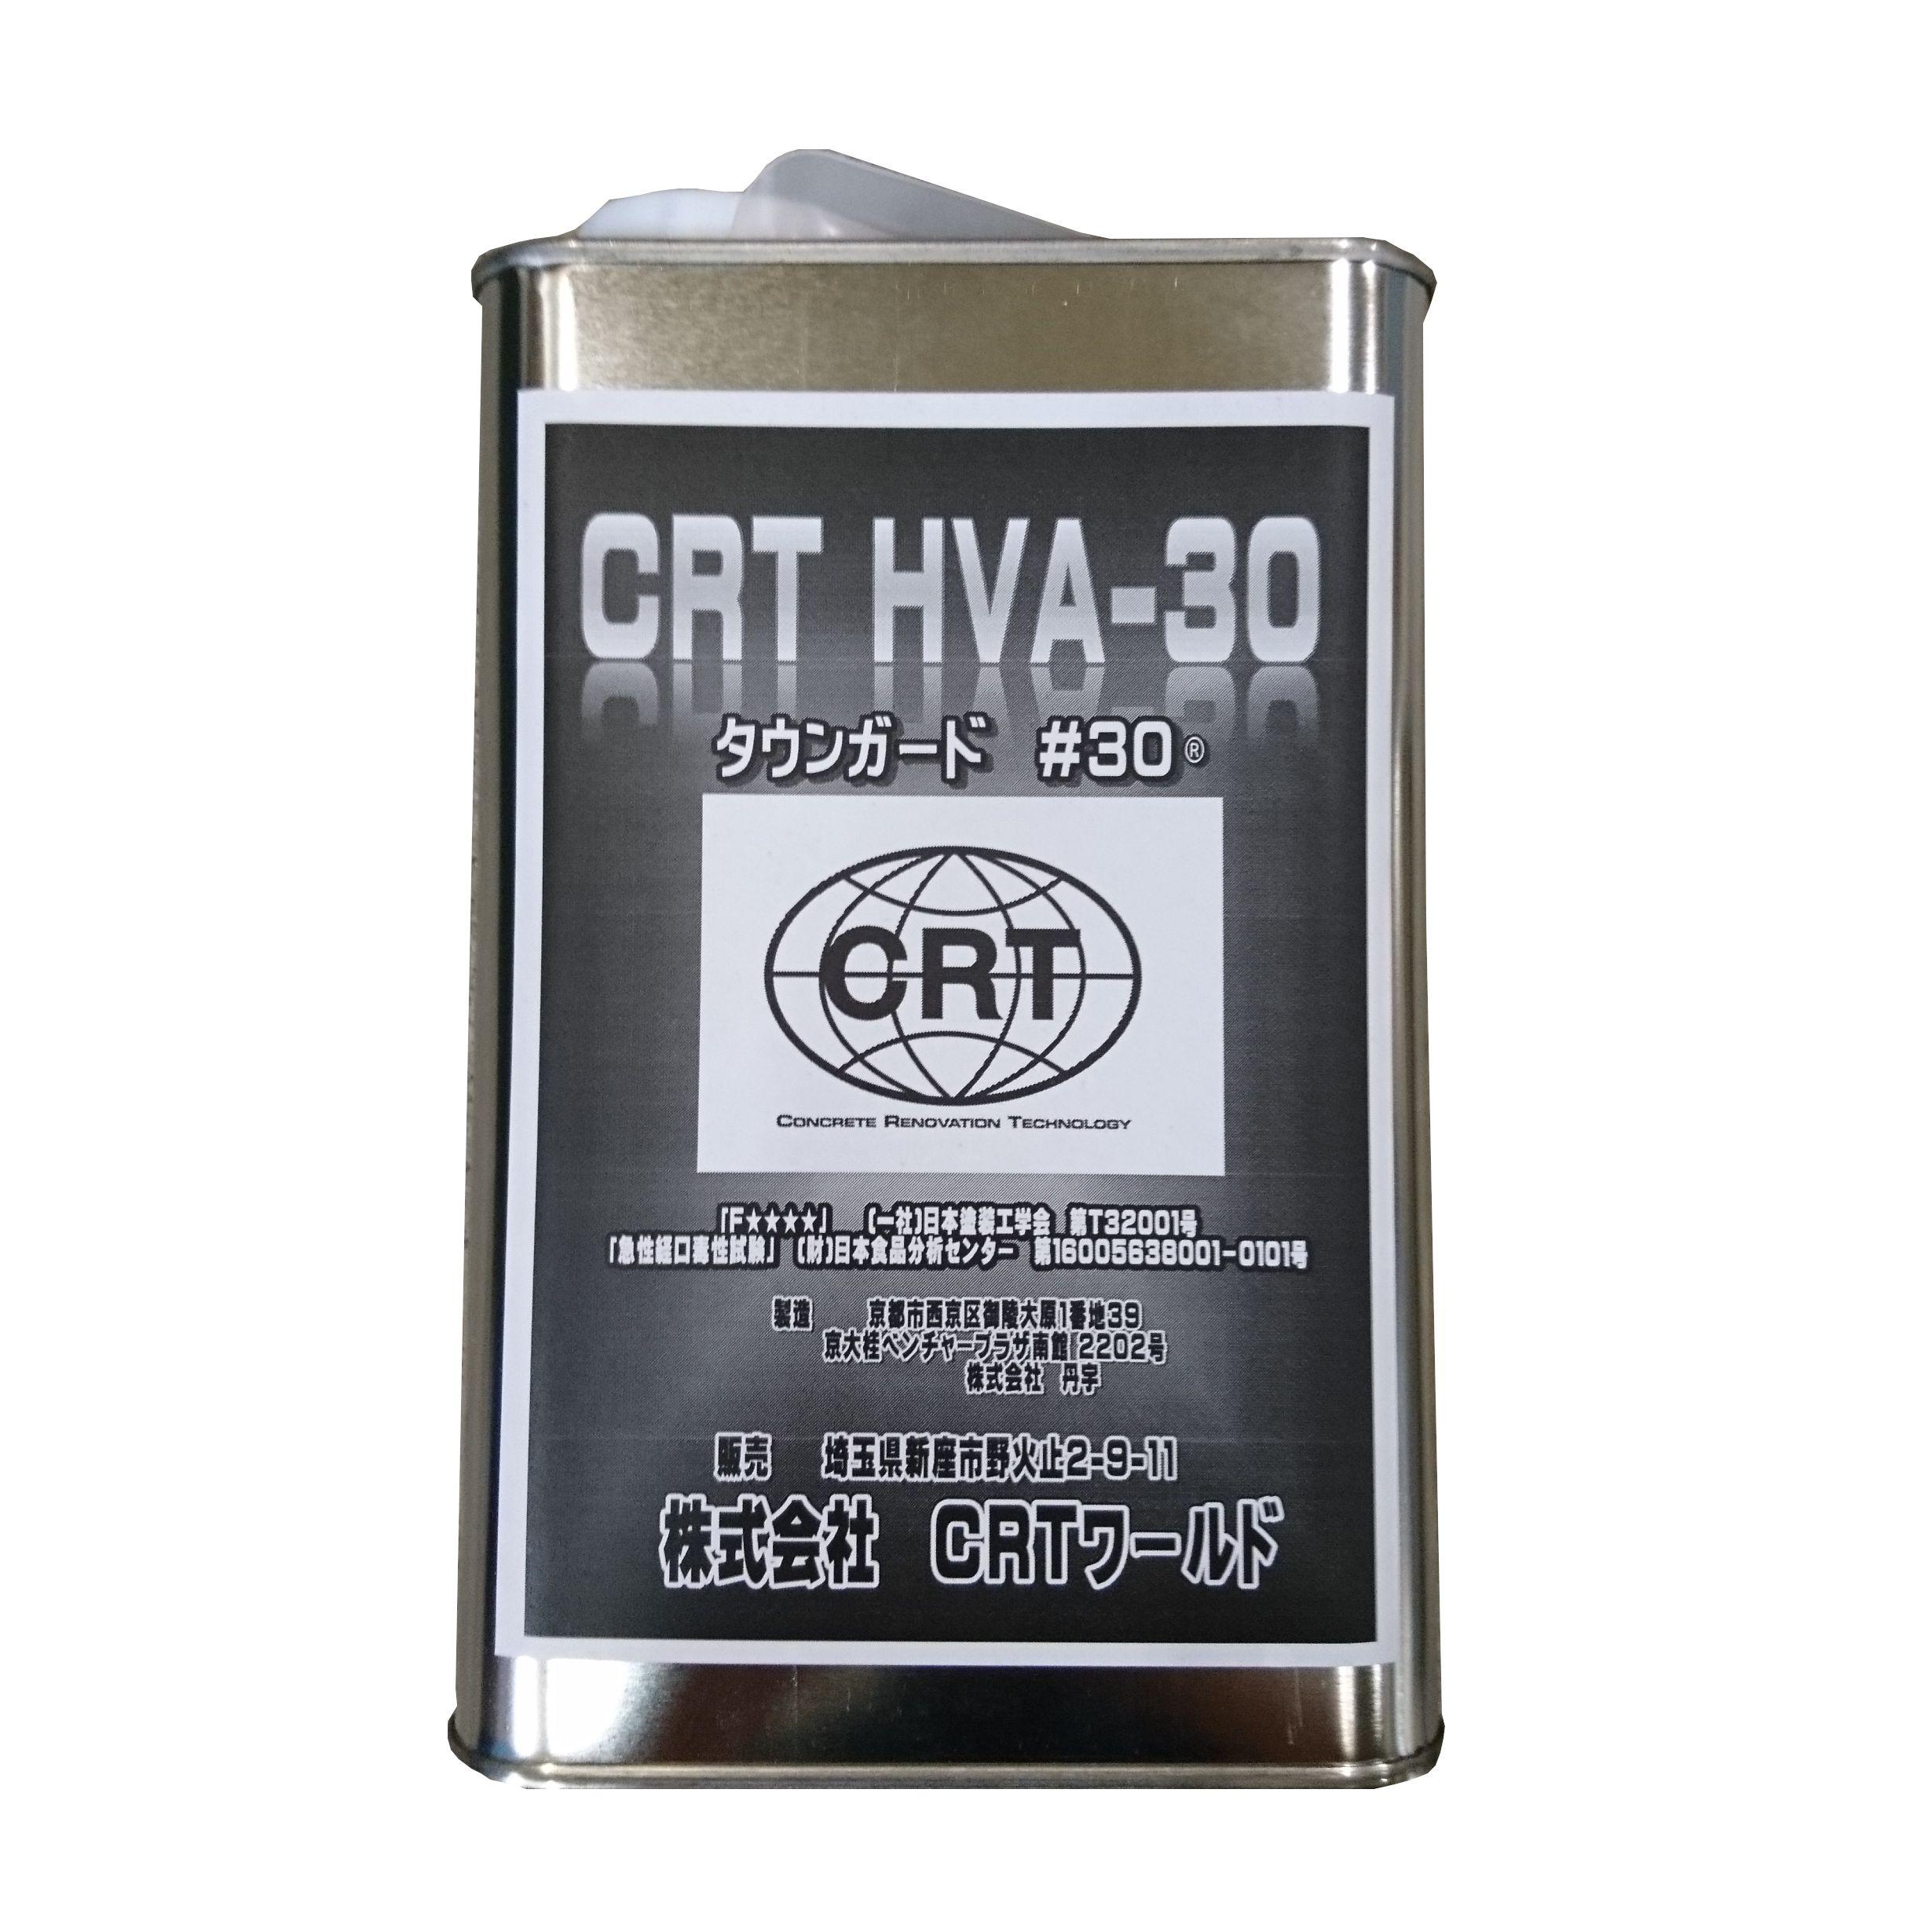 CRT HVA -30(コンクリート・モルタル用) ~経年劣化予防&防汚剤~